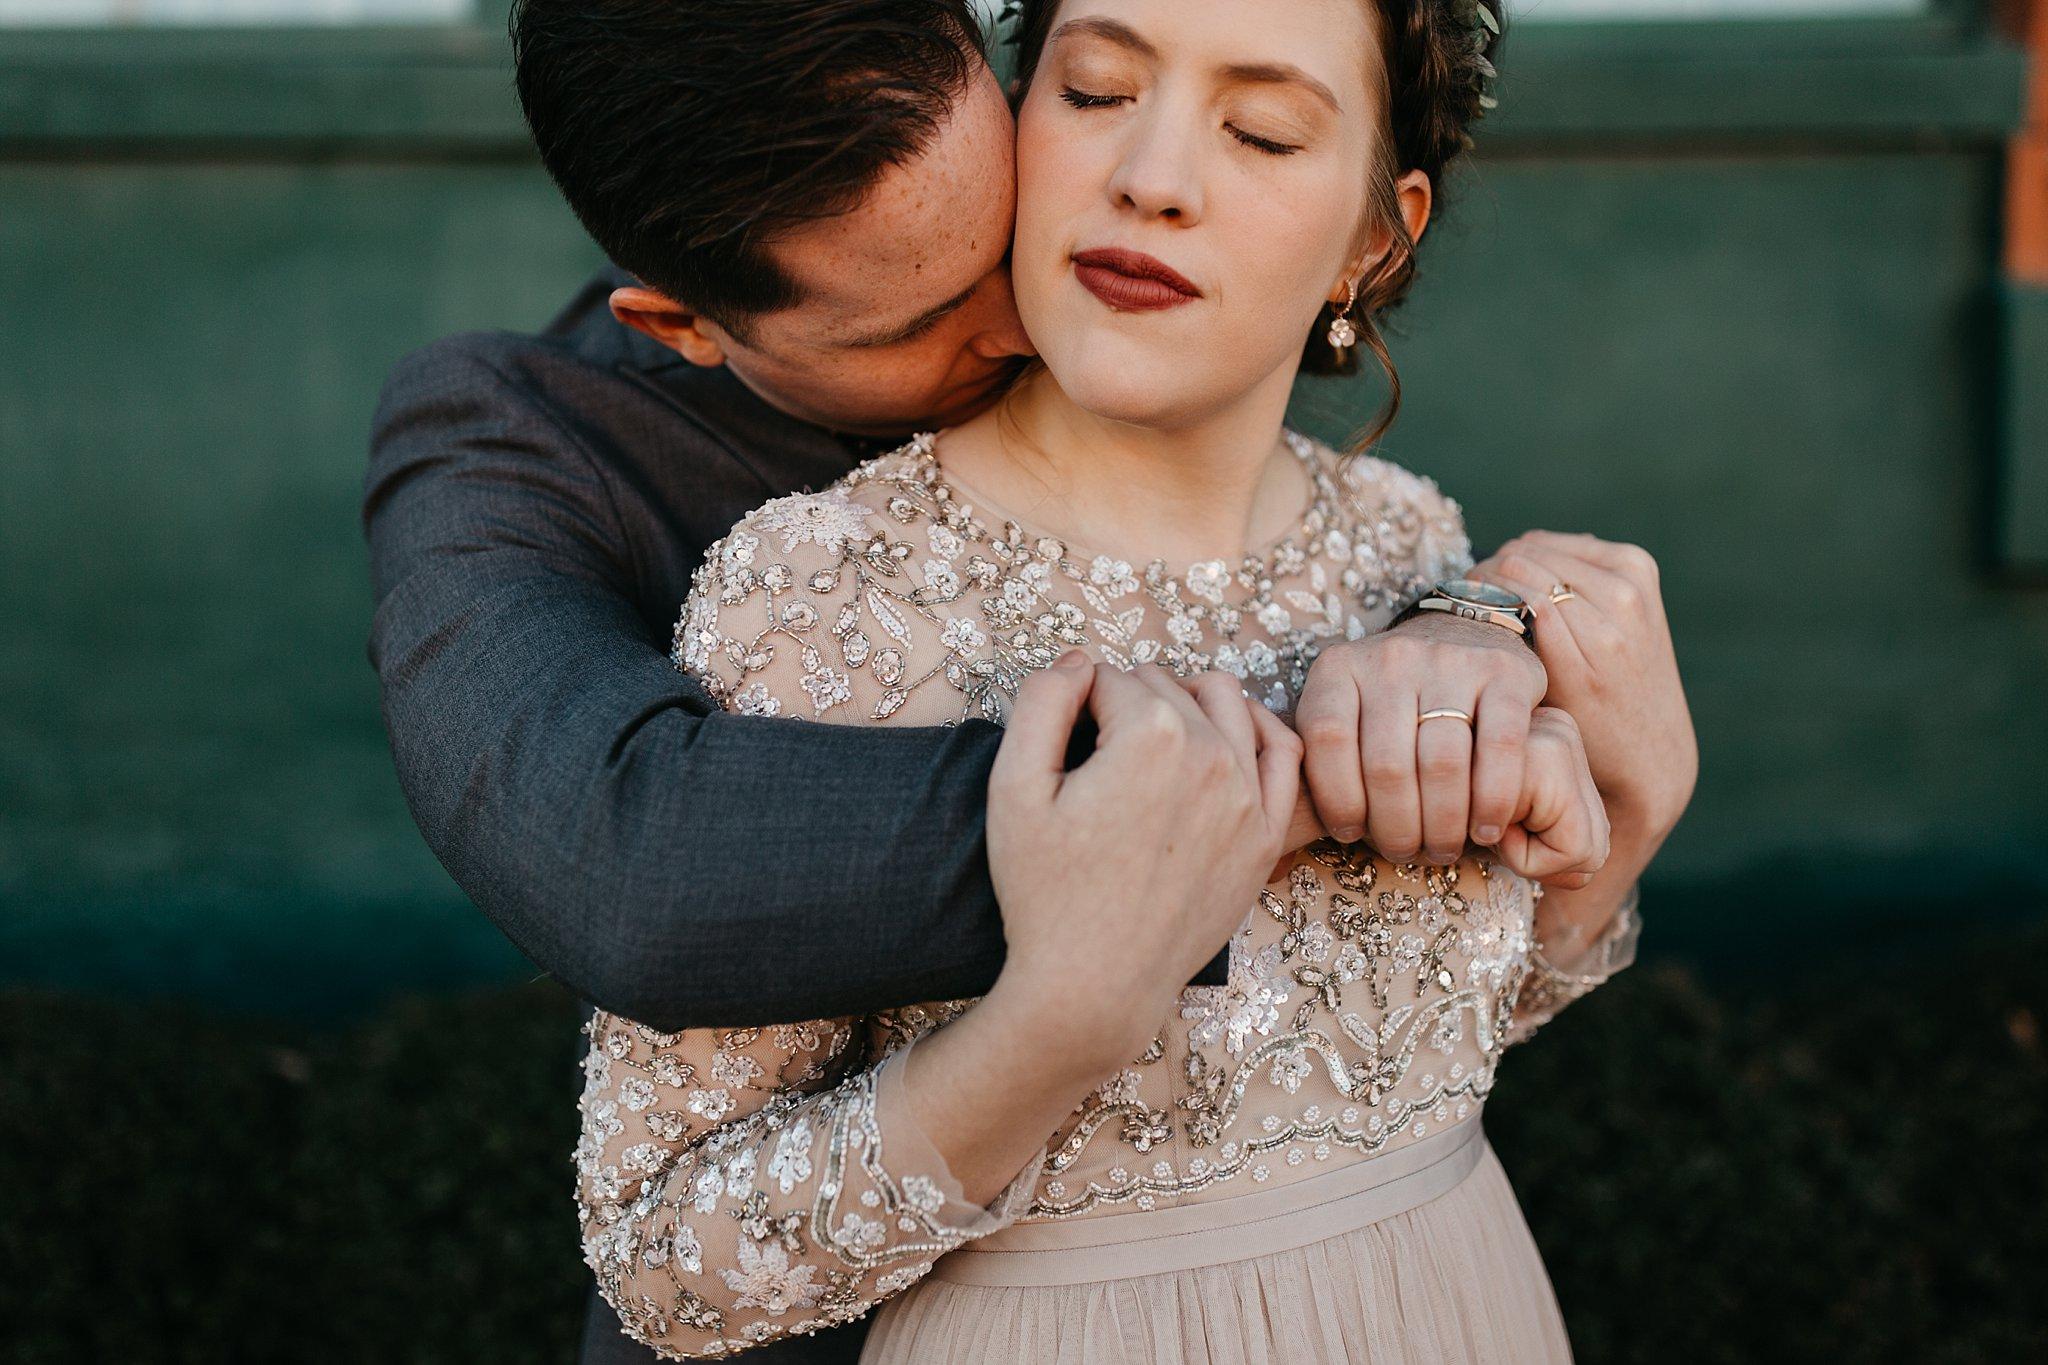 Wilderlove Co_Waco Texas_The Phoenix_Romantic Wedding Photography_0032.jpg